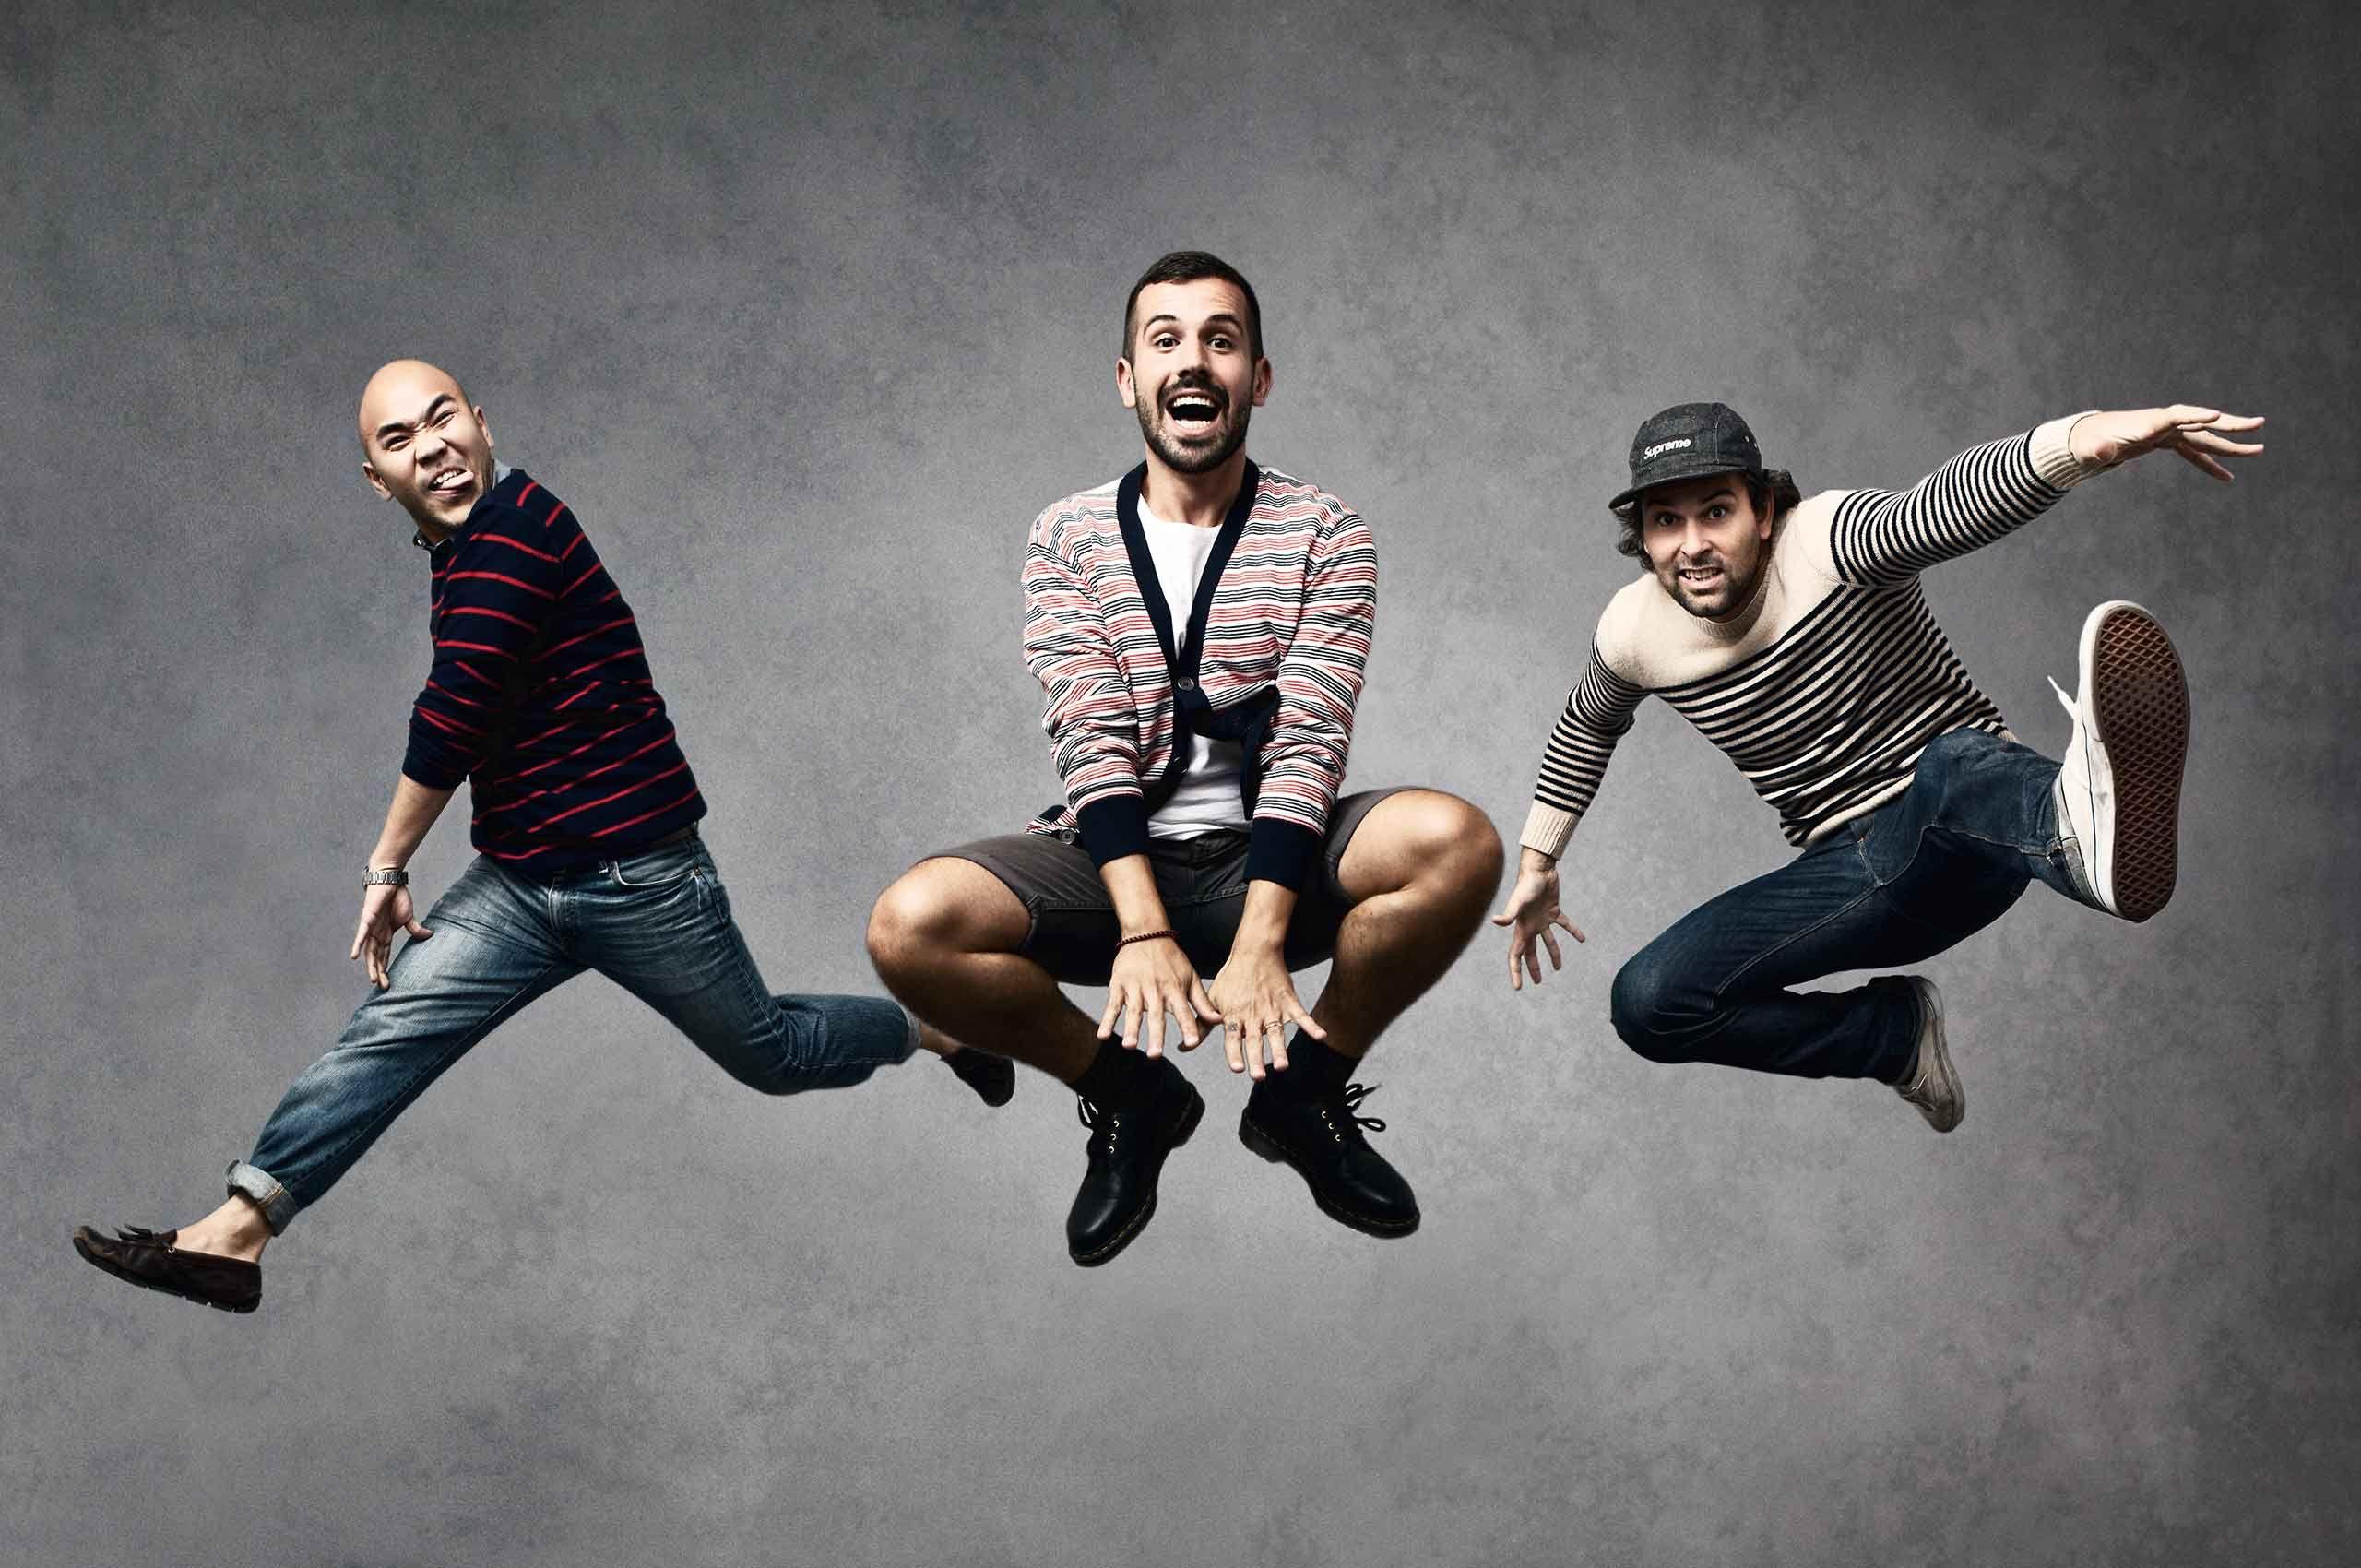 jumping-trio-by-HenrikOlundPhotography.jpg